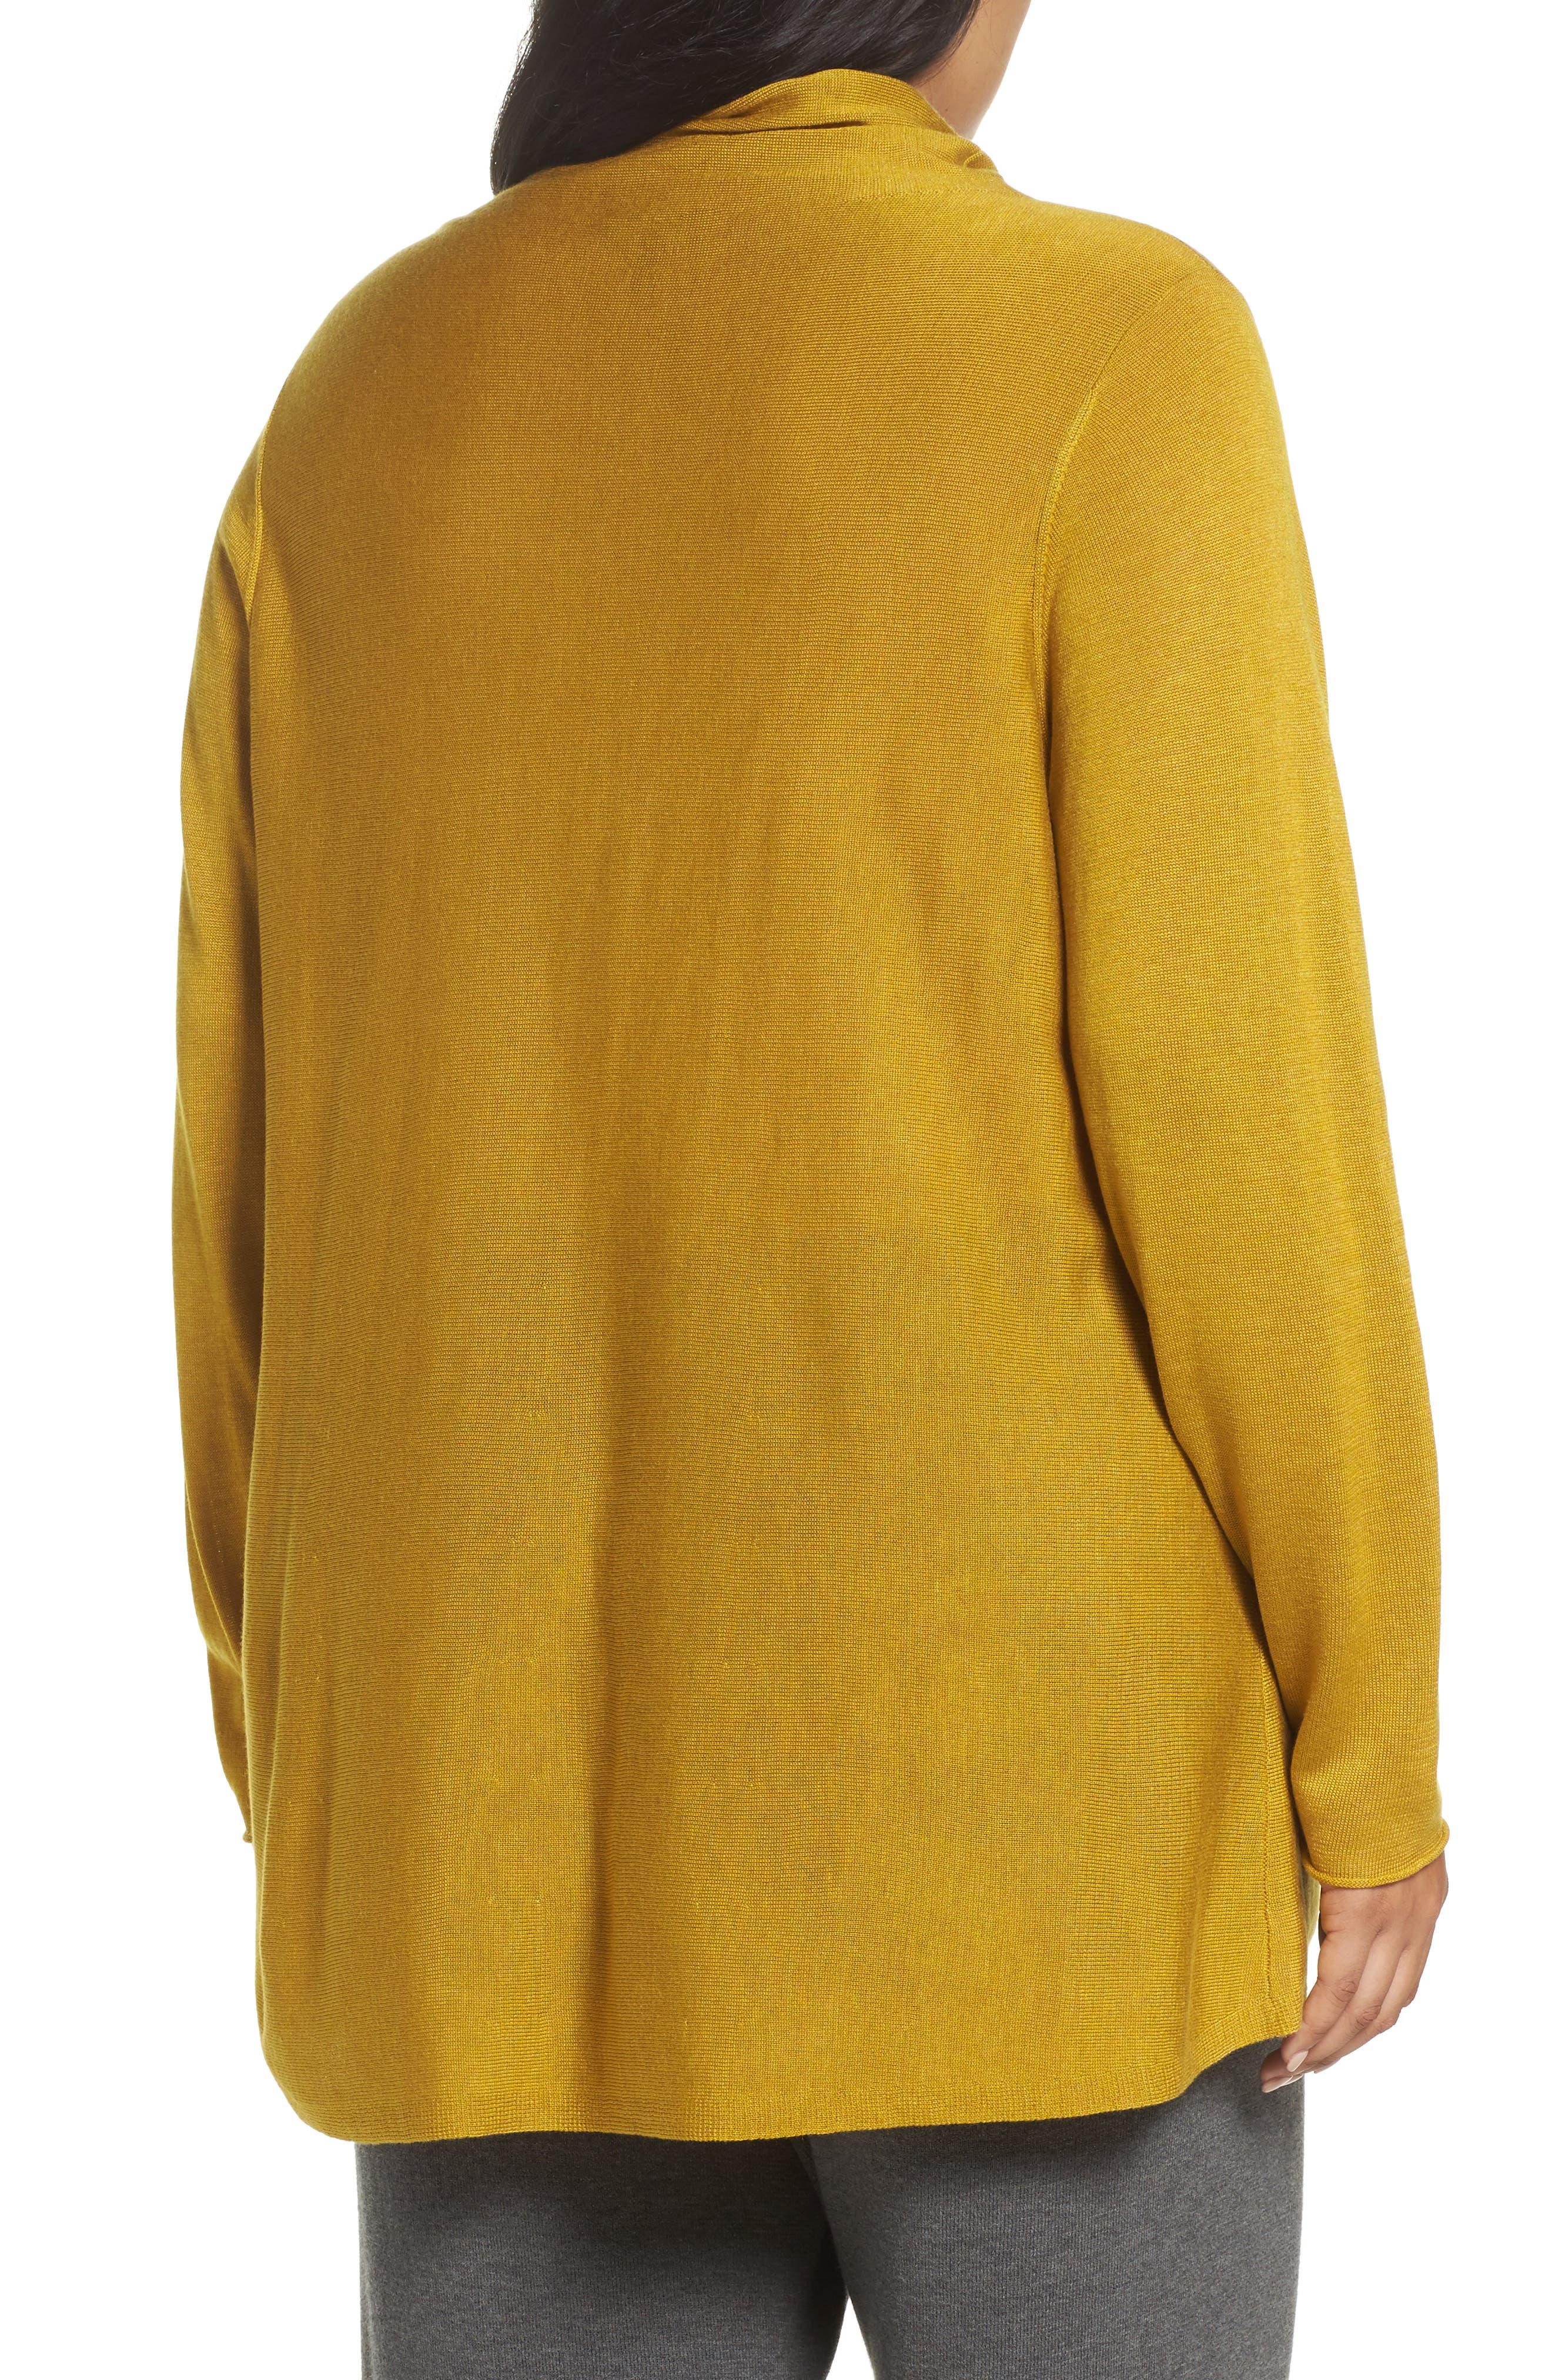 Alternate Image 2  - Eileen Fisher Scrunch Turtleneck Sweater (Plus Size)